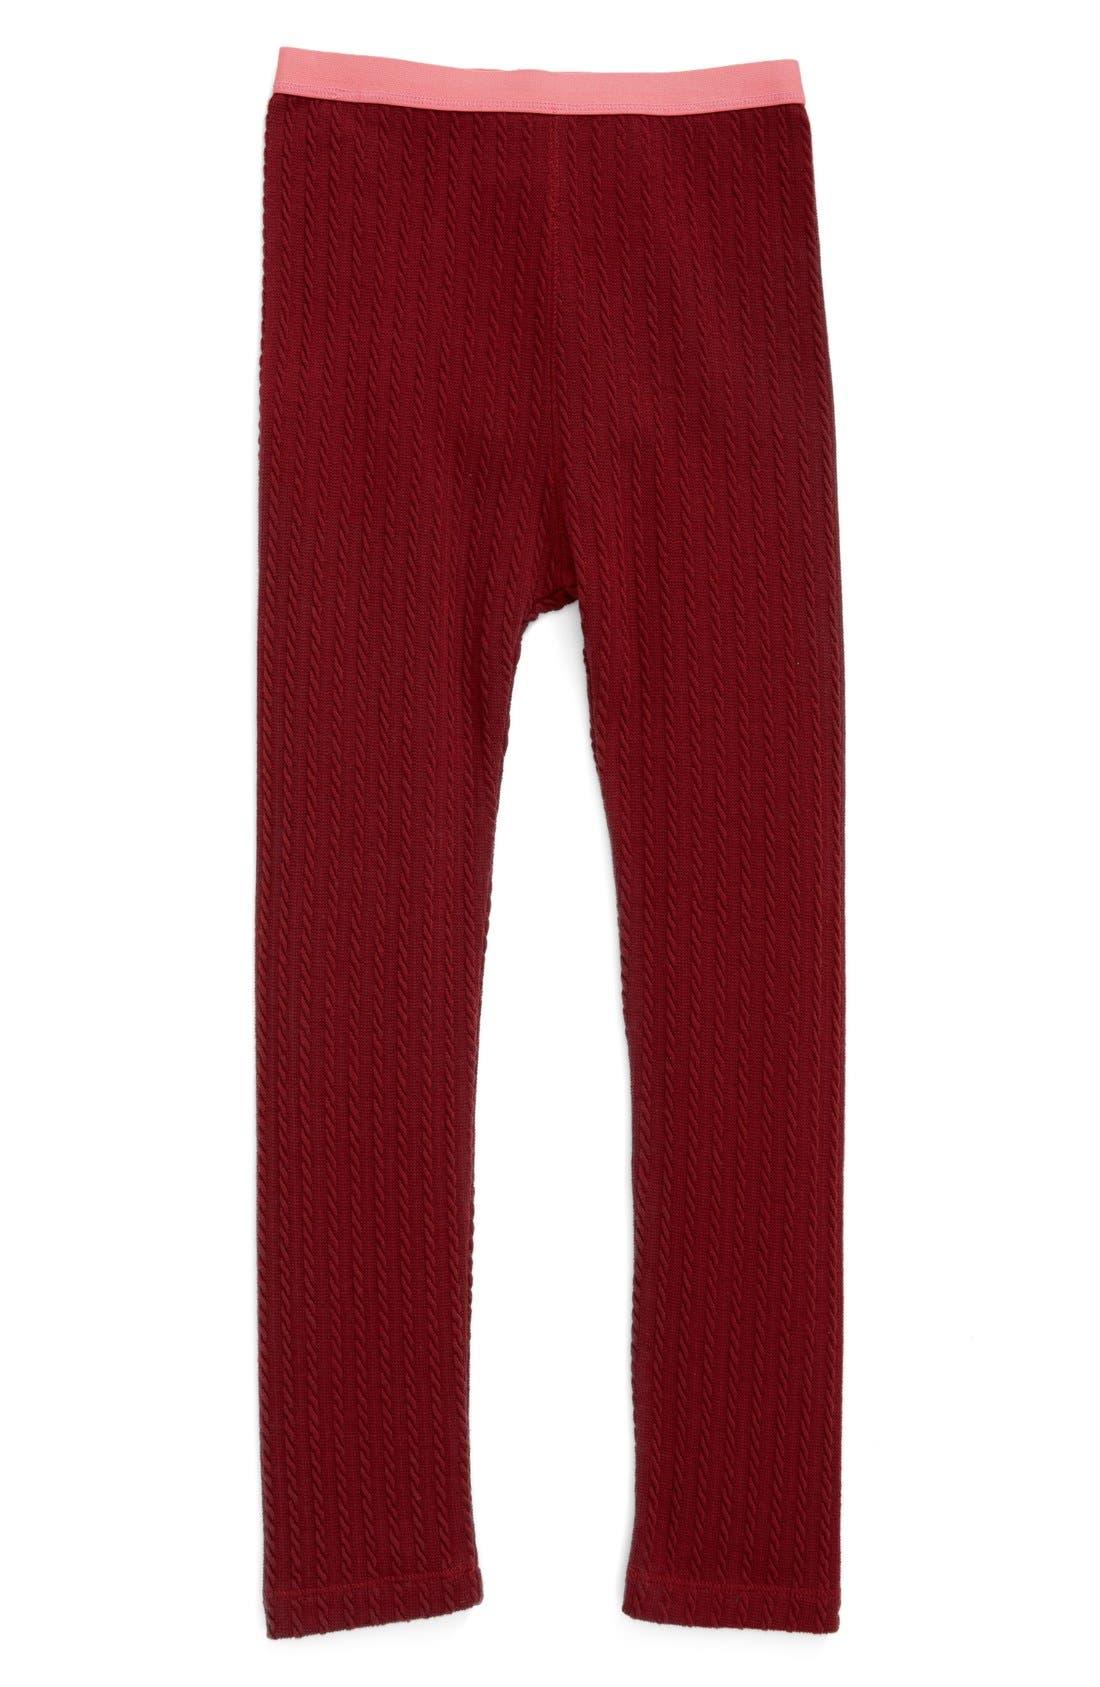 Cable Knit Leggings,                             Main thumbnail 4, color,